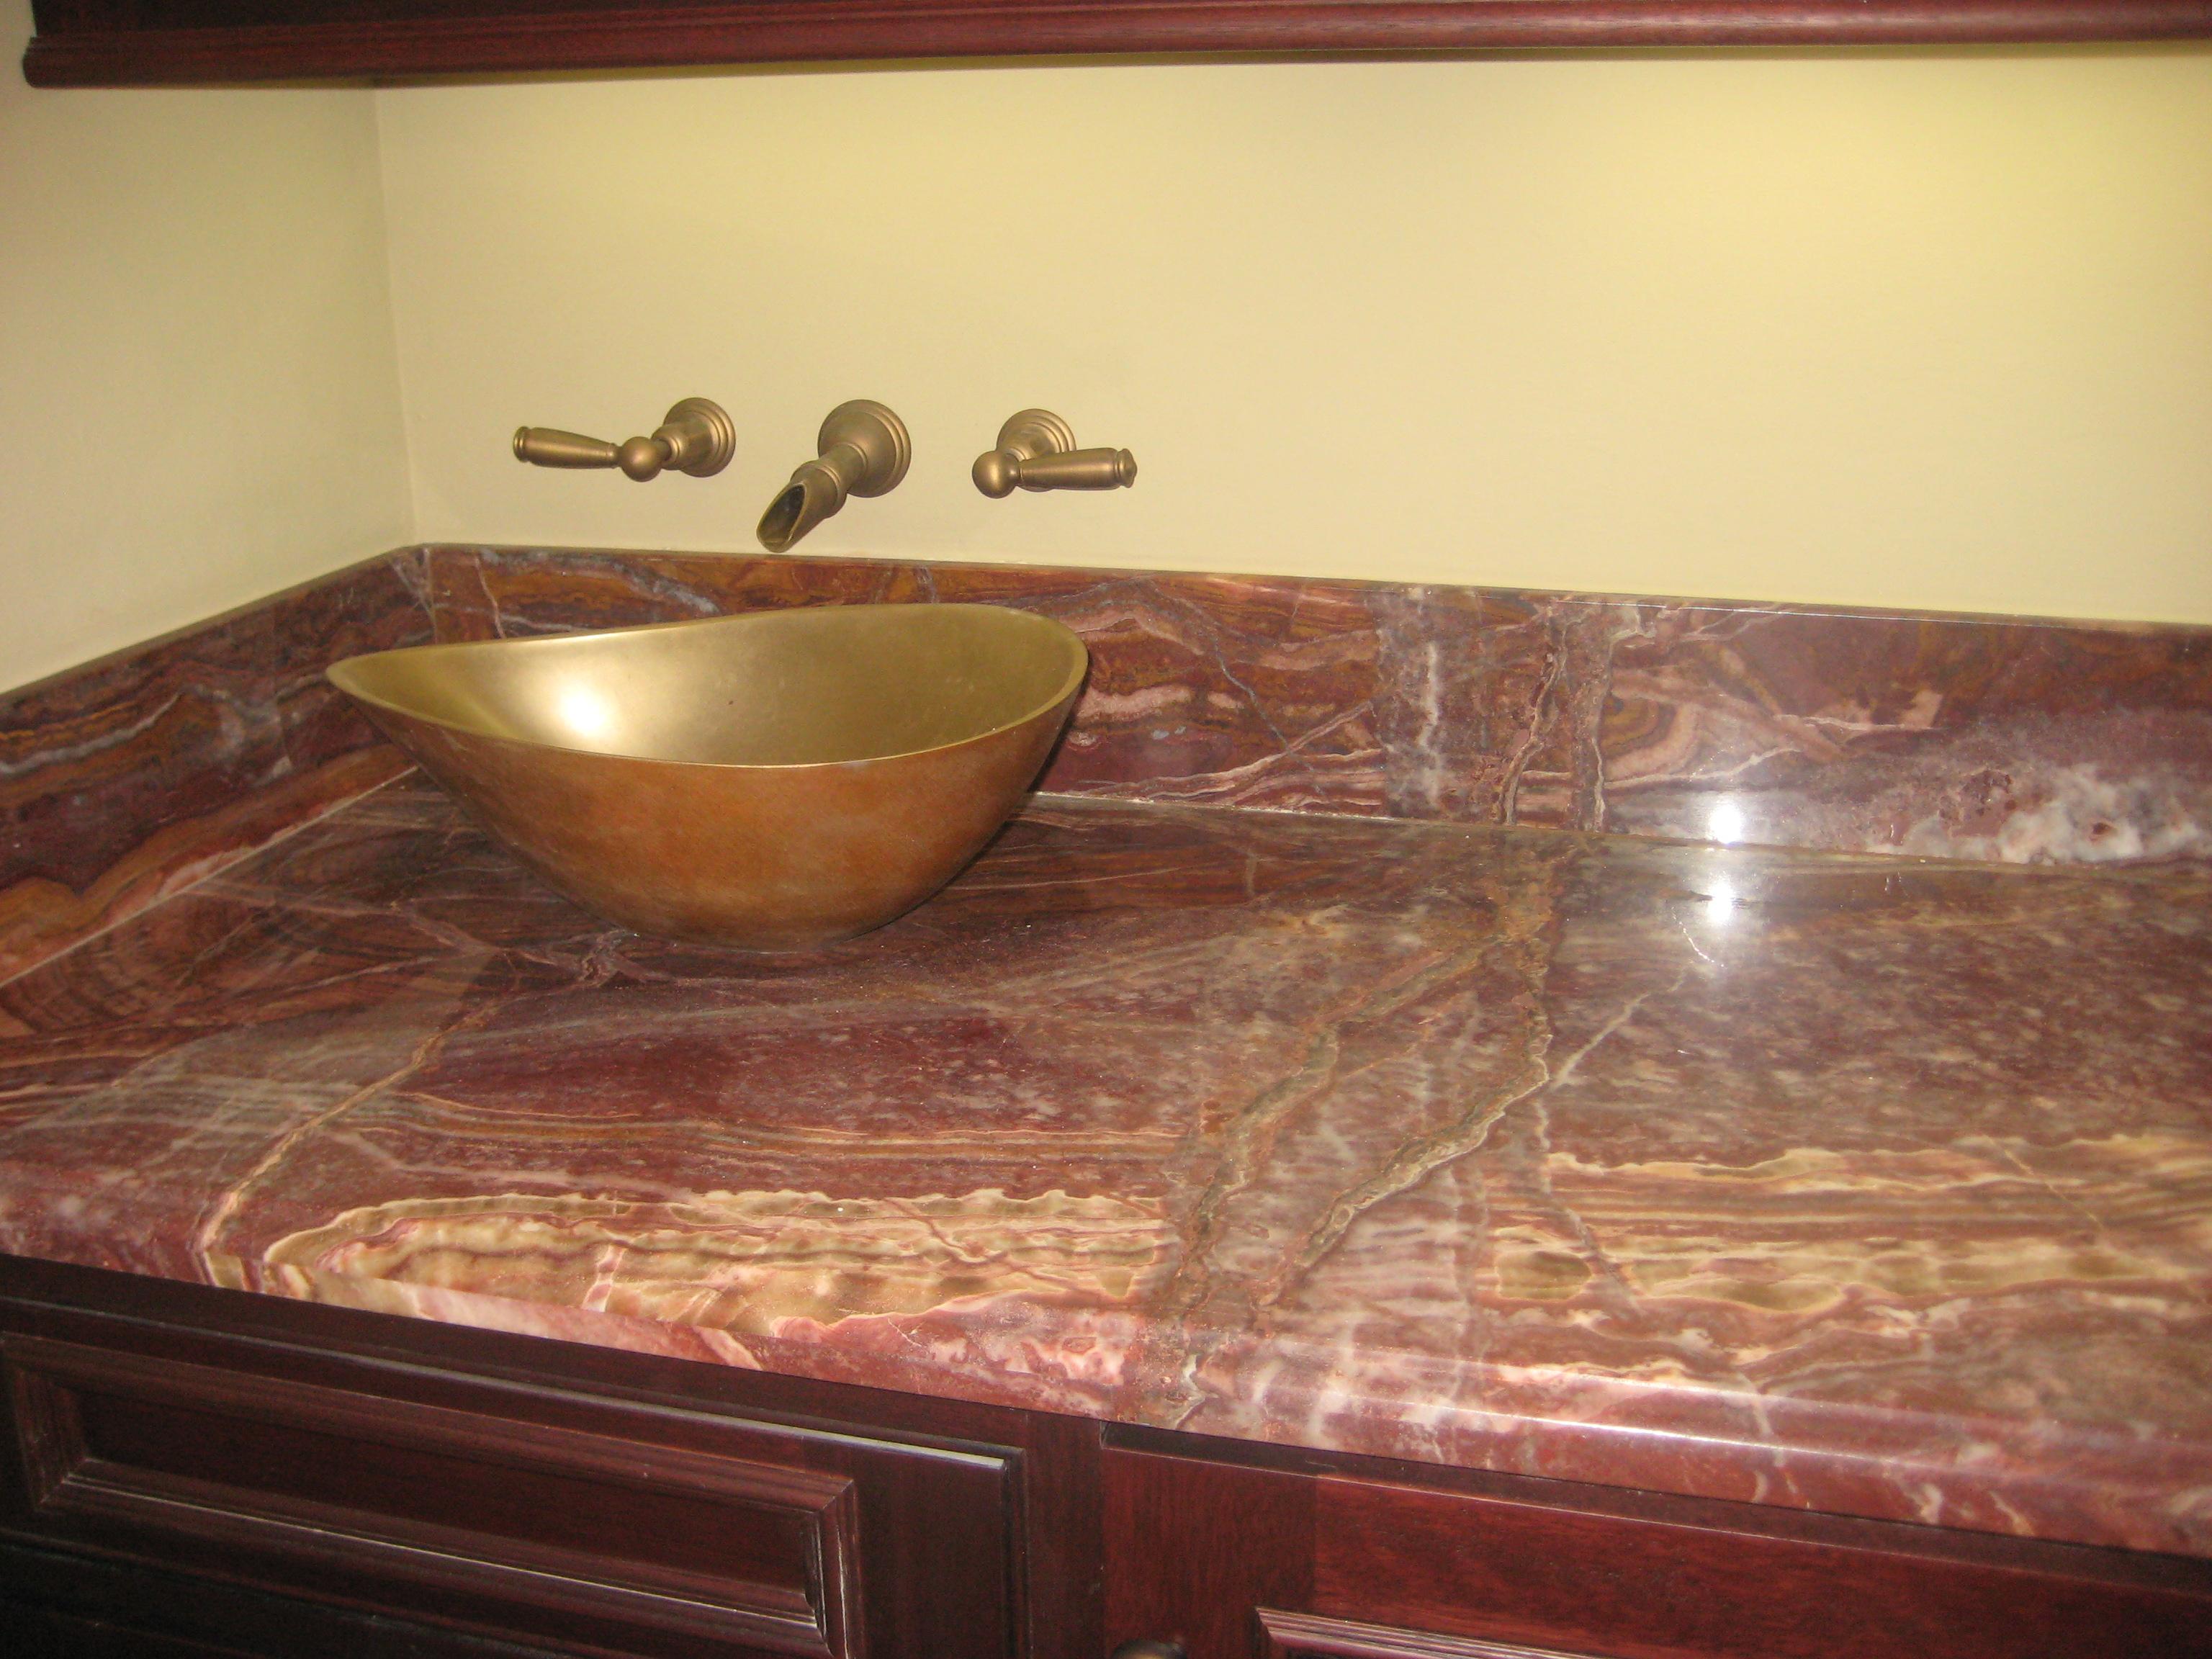 picture costa countertops close naples granite esmeralda gr fl axd up tile slabs image